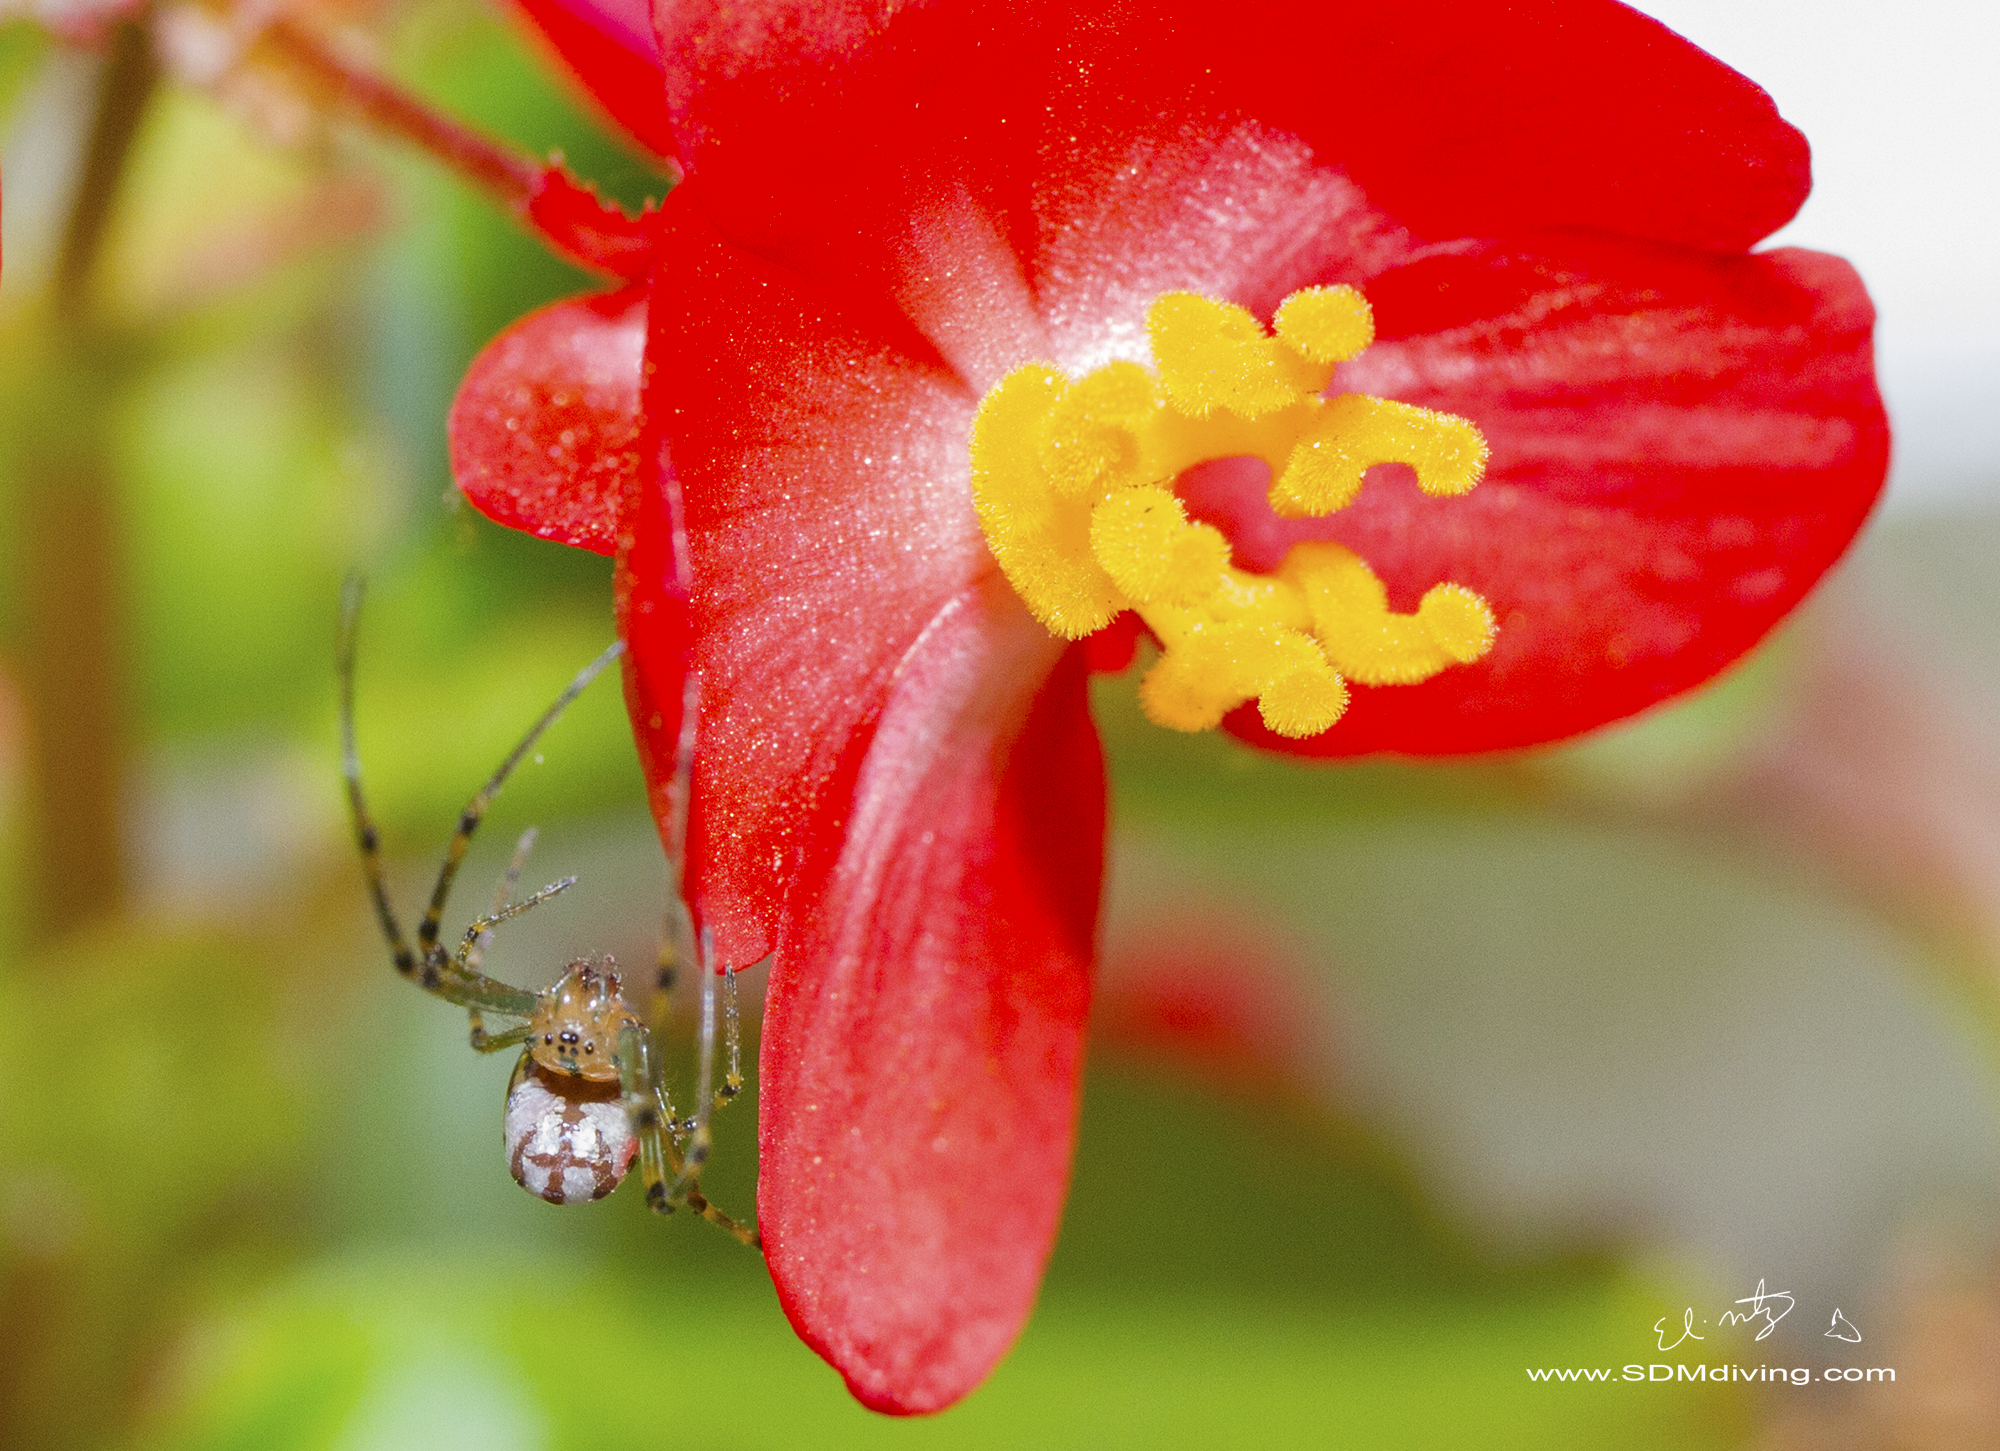 1. Orchard Spider